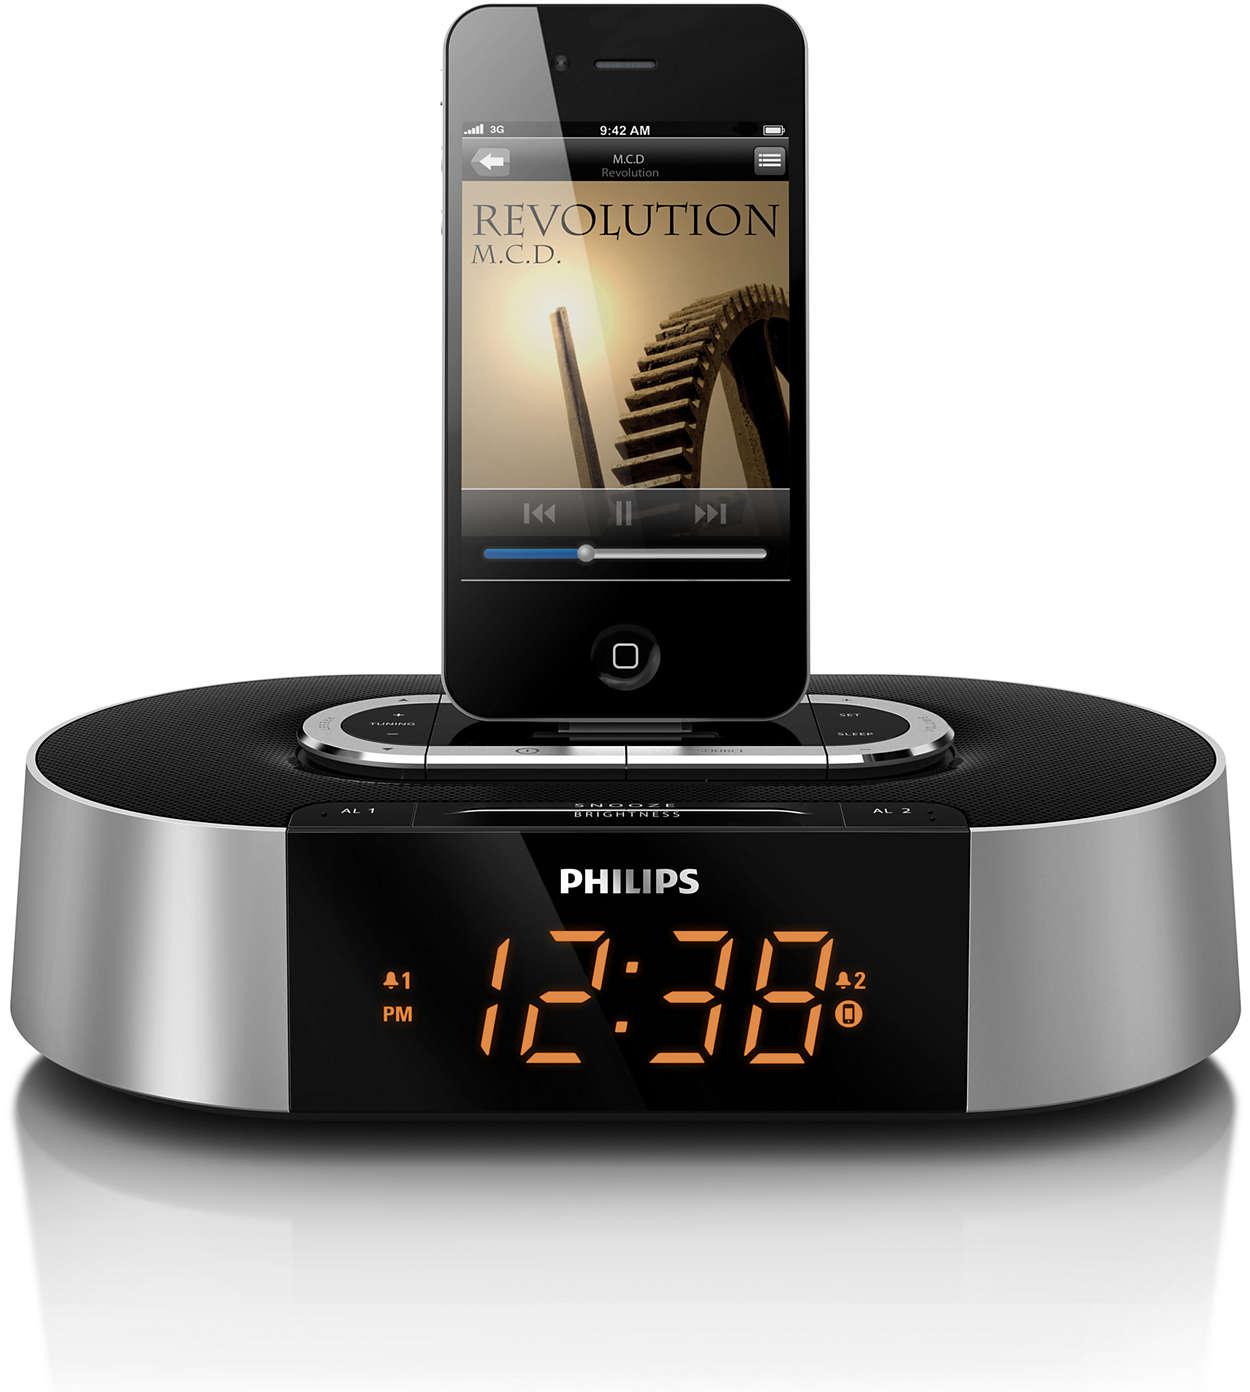 Philips 30-Pin Apple iPod Dock Alarm Clock Radio AJ3270D//37